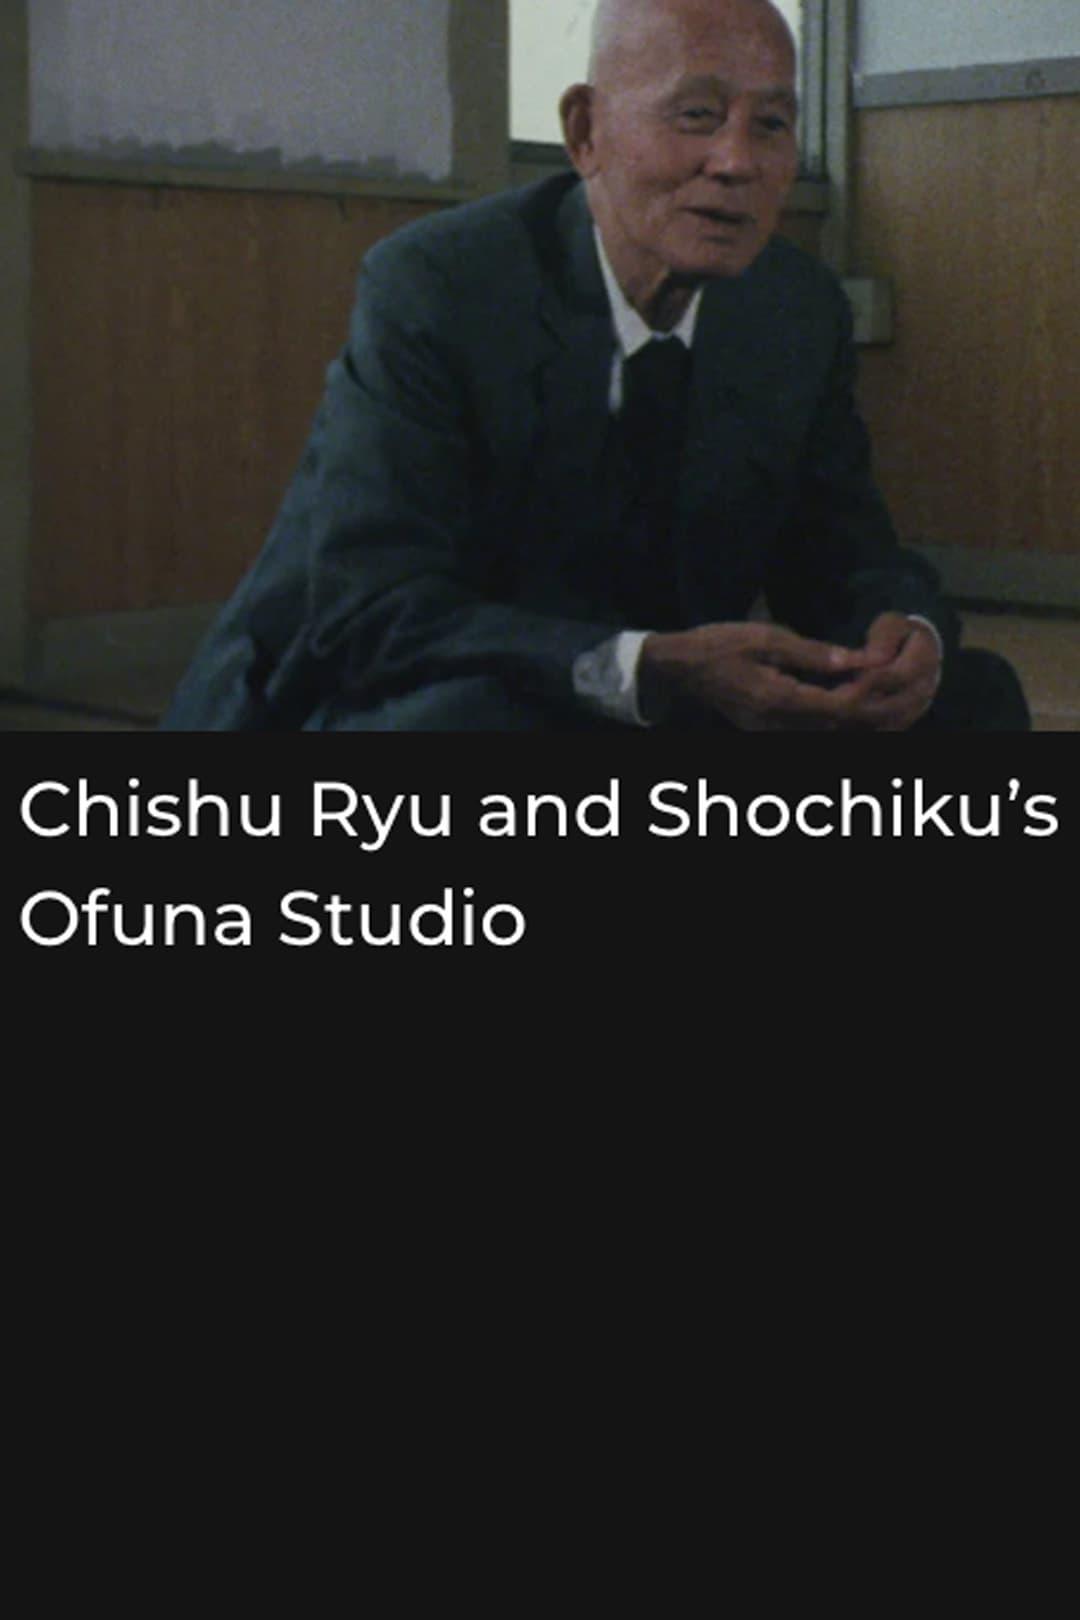 Chishu Ryu the Actor: Shochiku's Ofuna Studio and Me